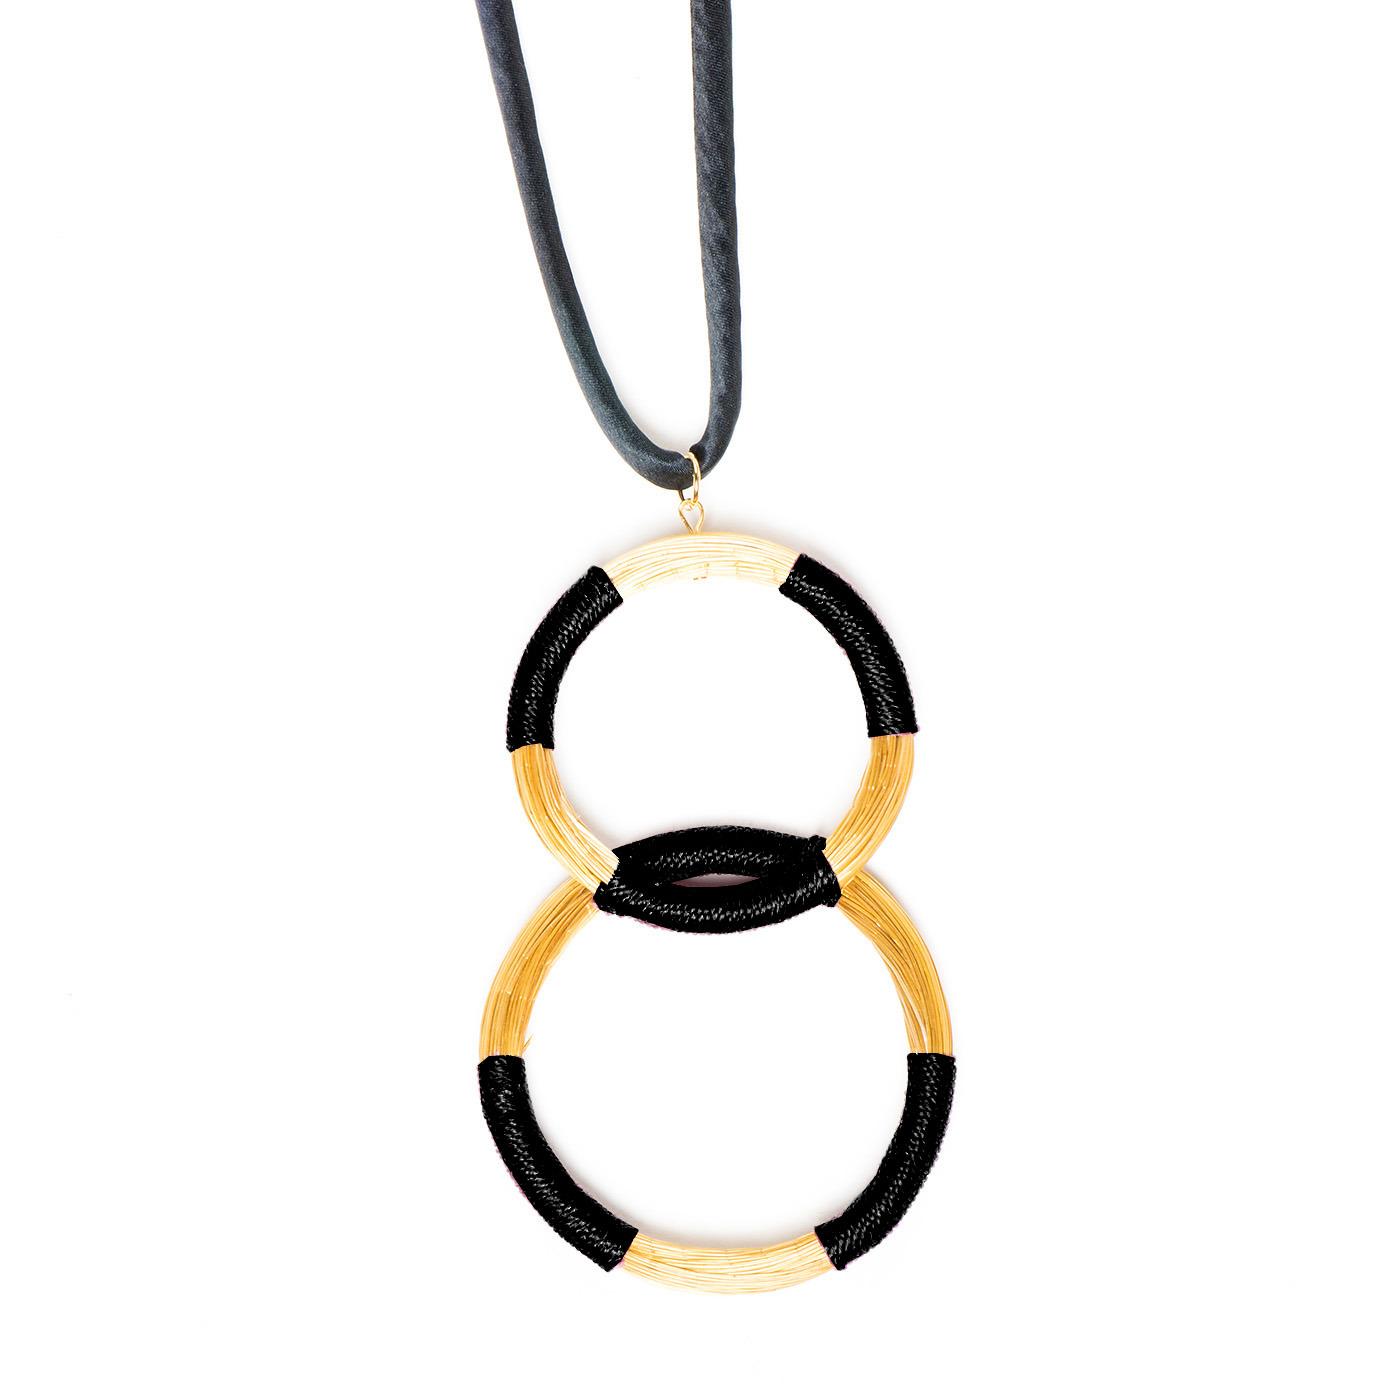 Artisan, Eco-Friendly, Designer Threaded Hoop Necklace